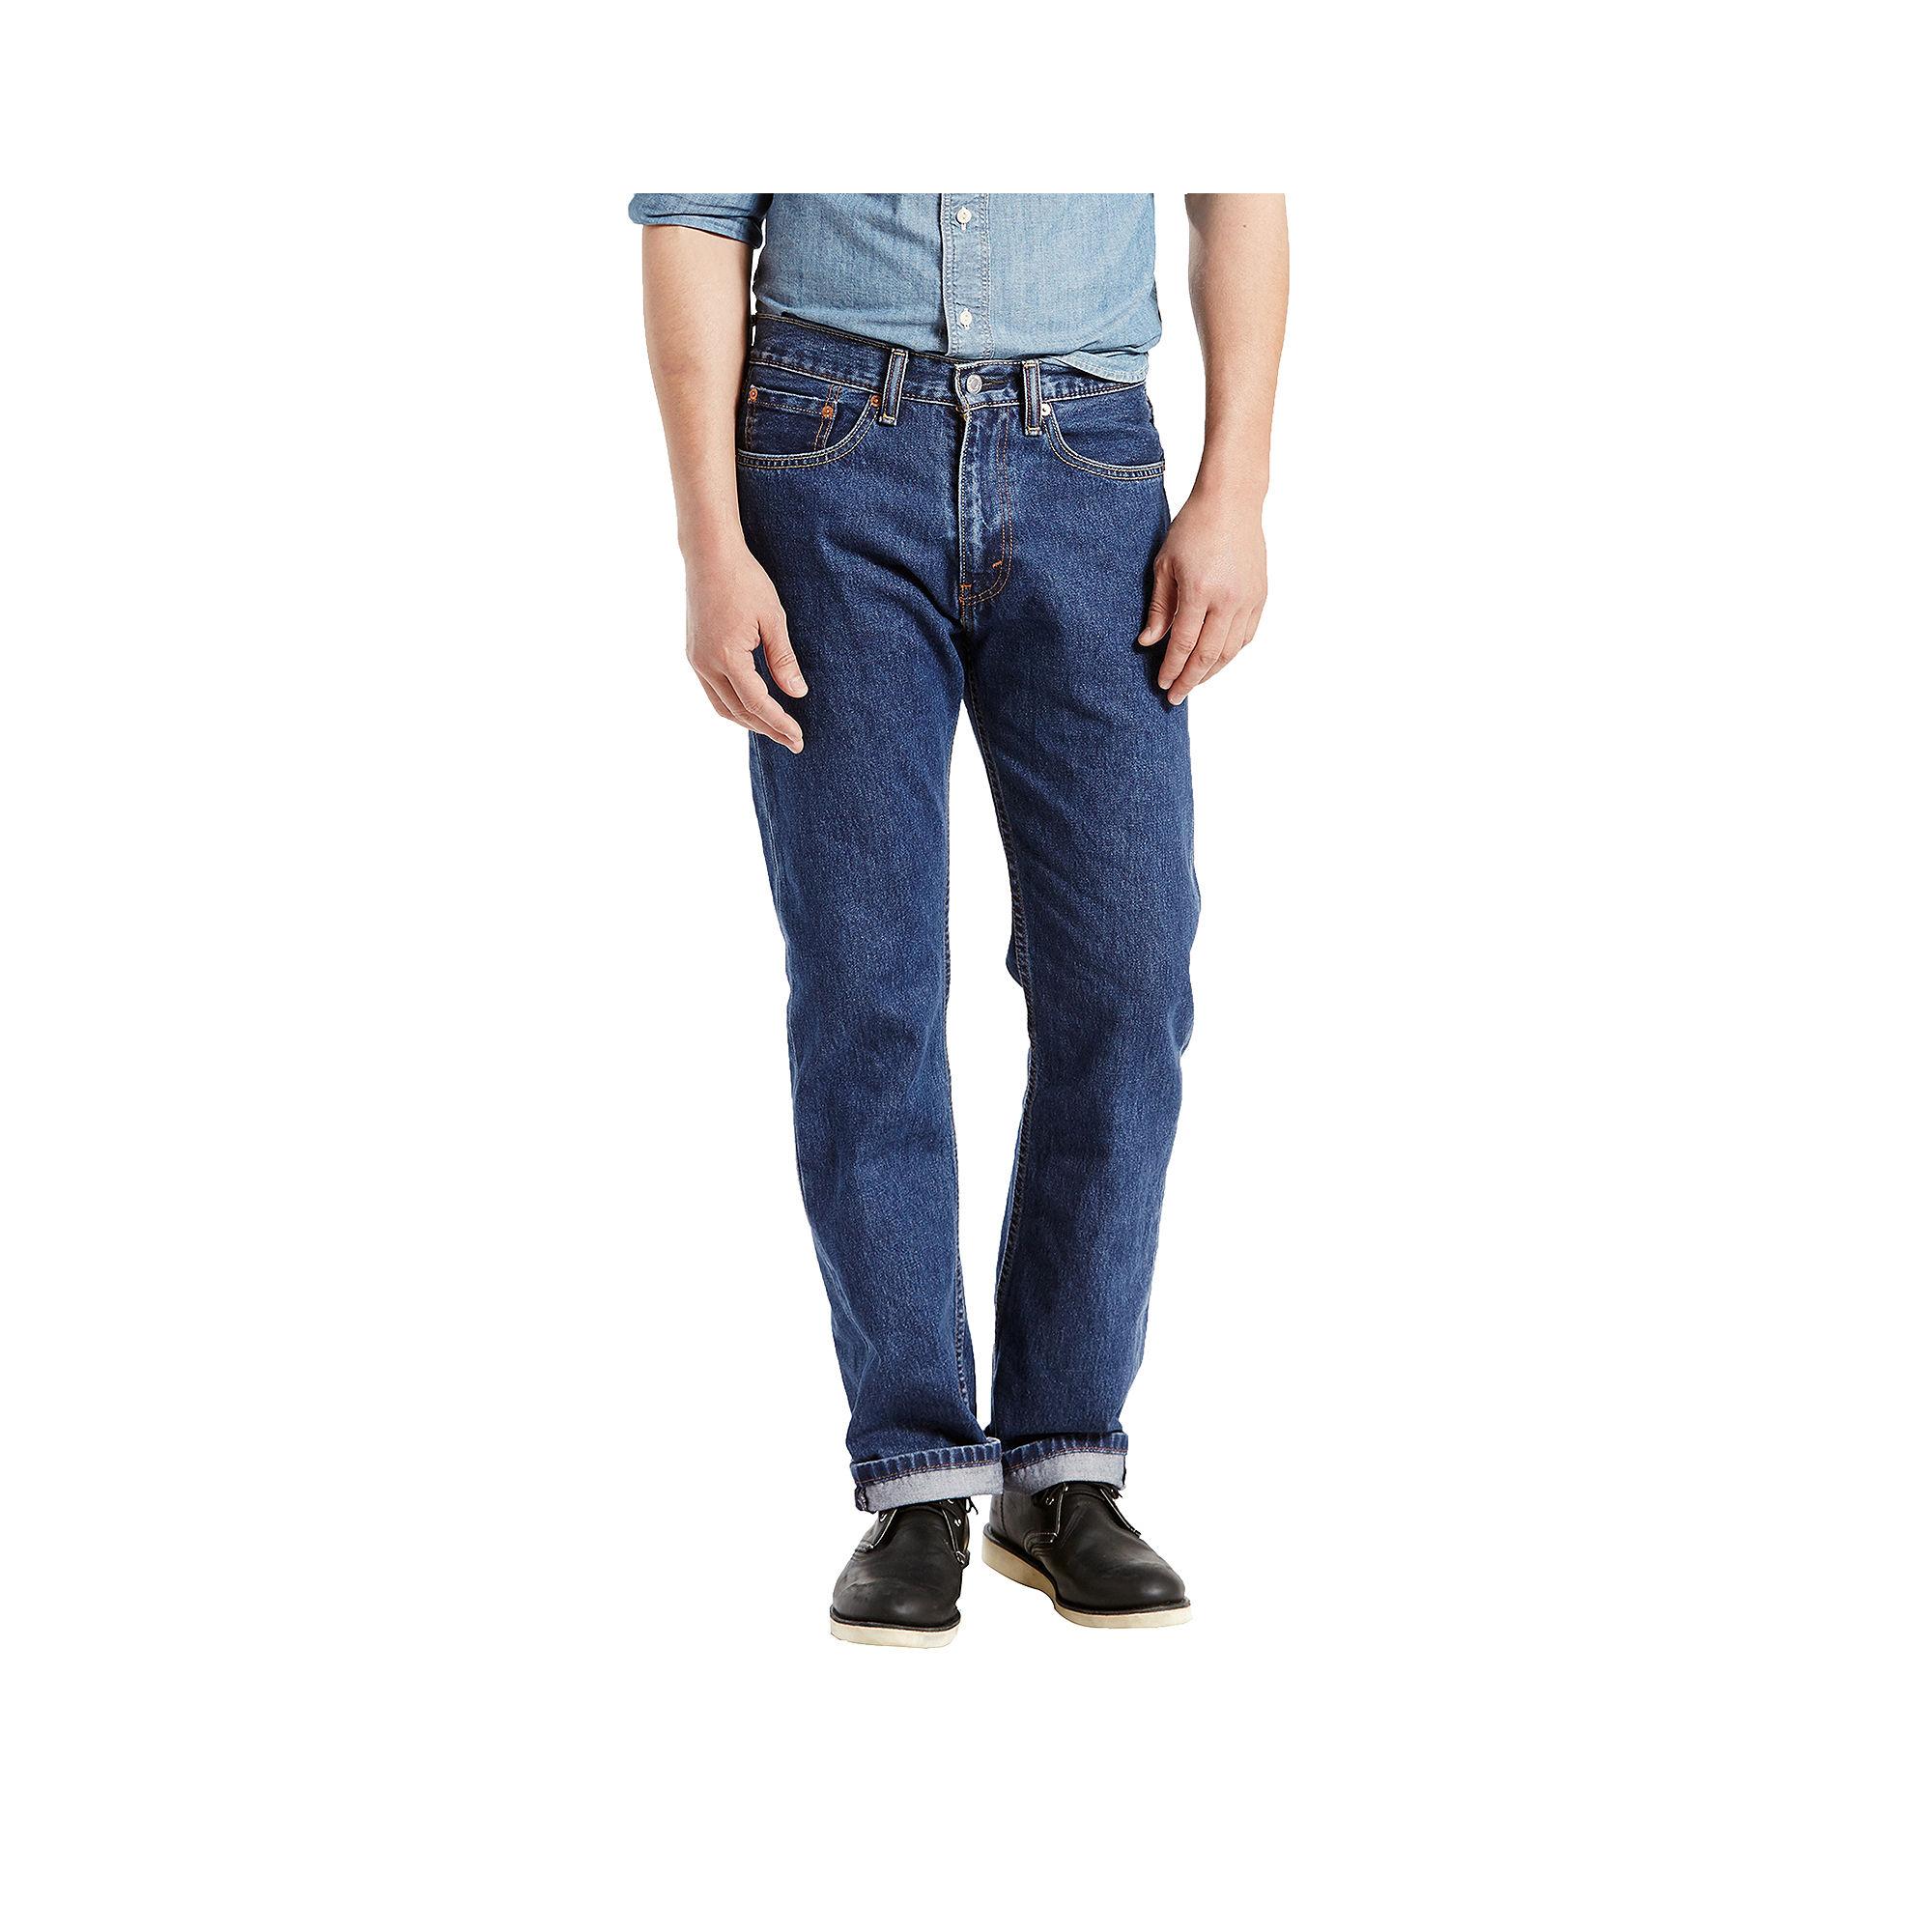 "Levi's 505"" Regular Fit Jeans"